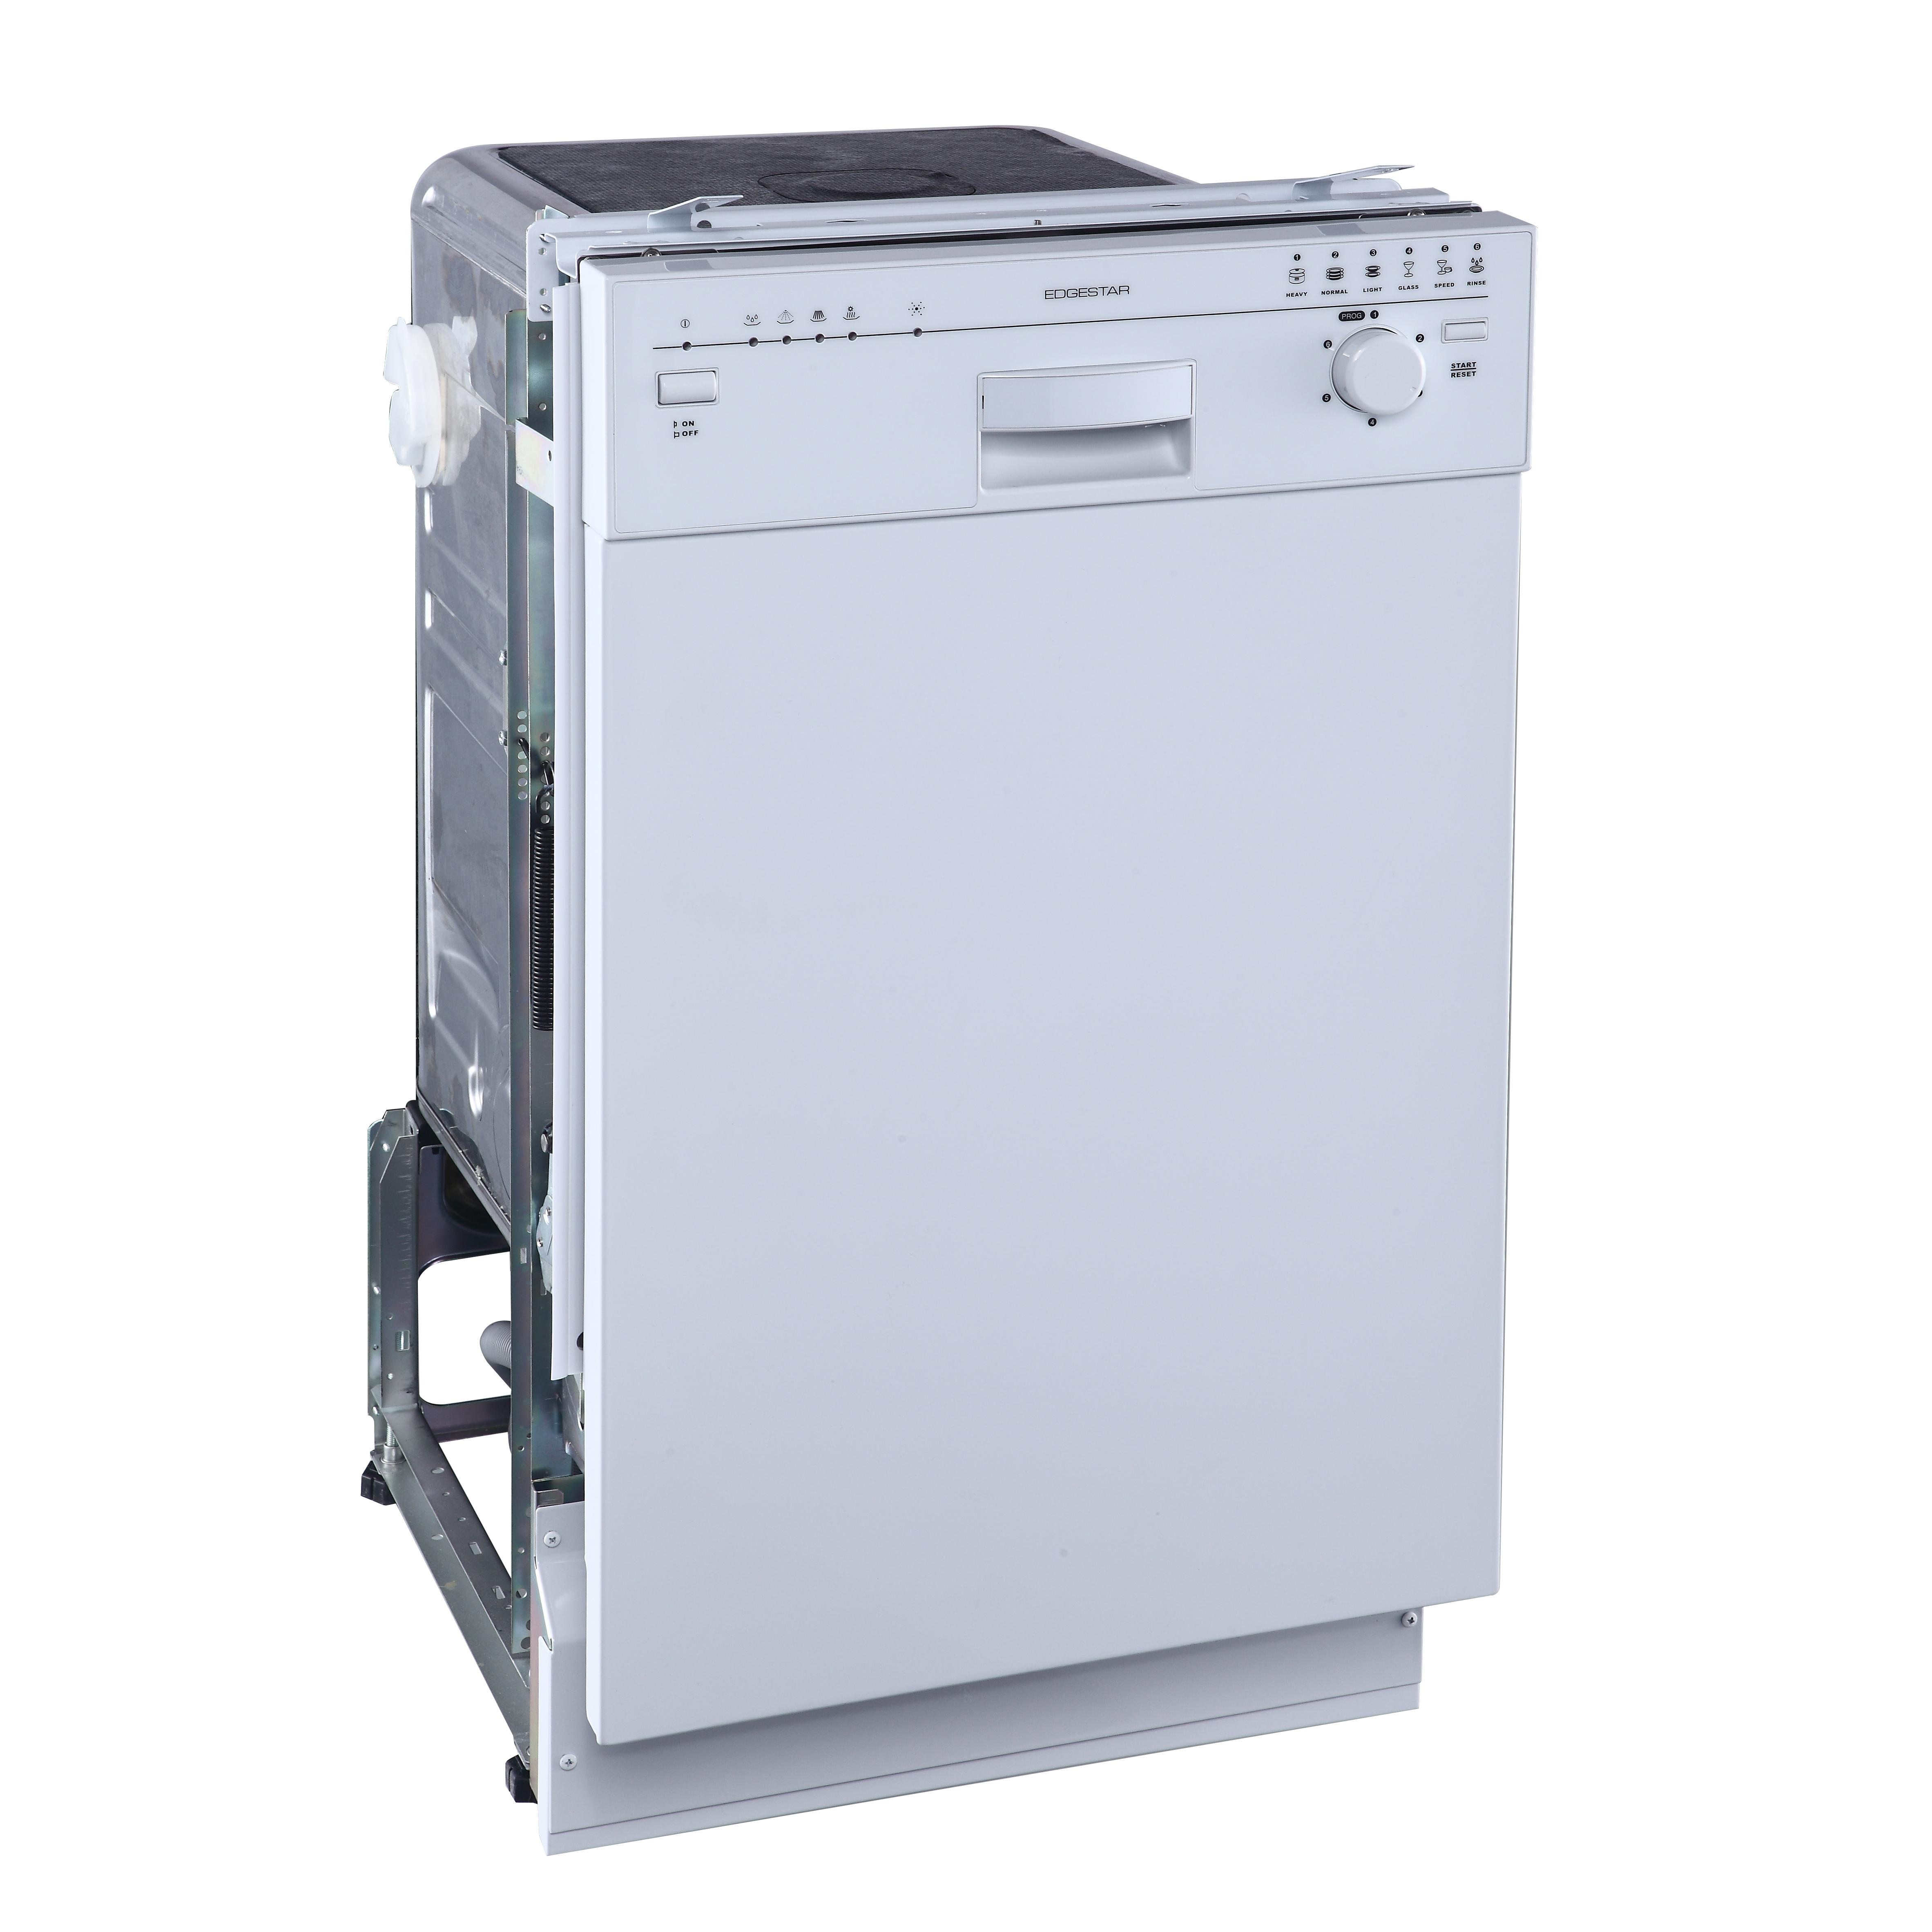 New Bidw1801w Edgestar 18 Built In Dishwasher White Ebay